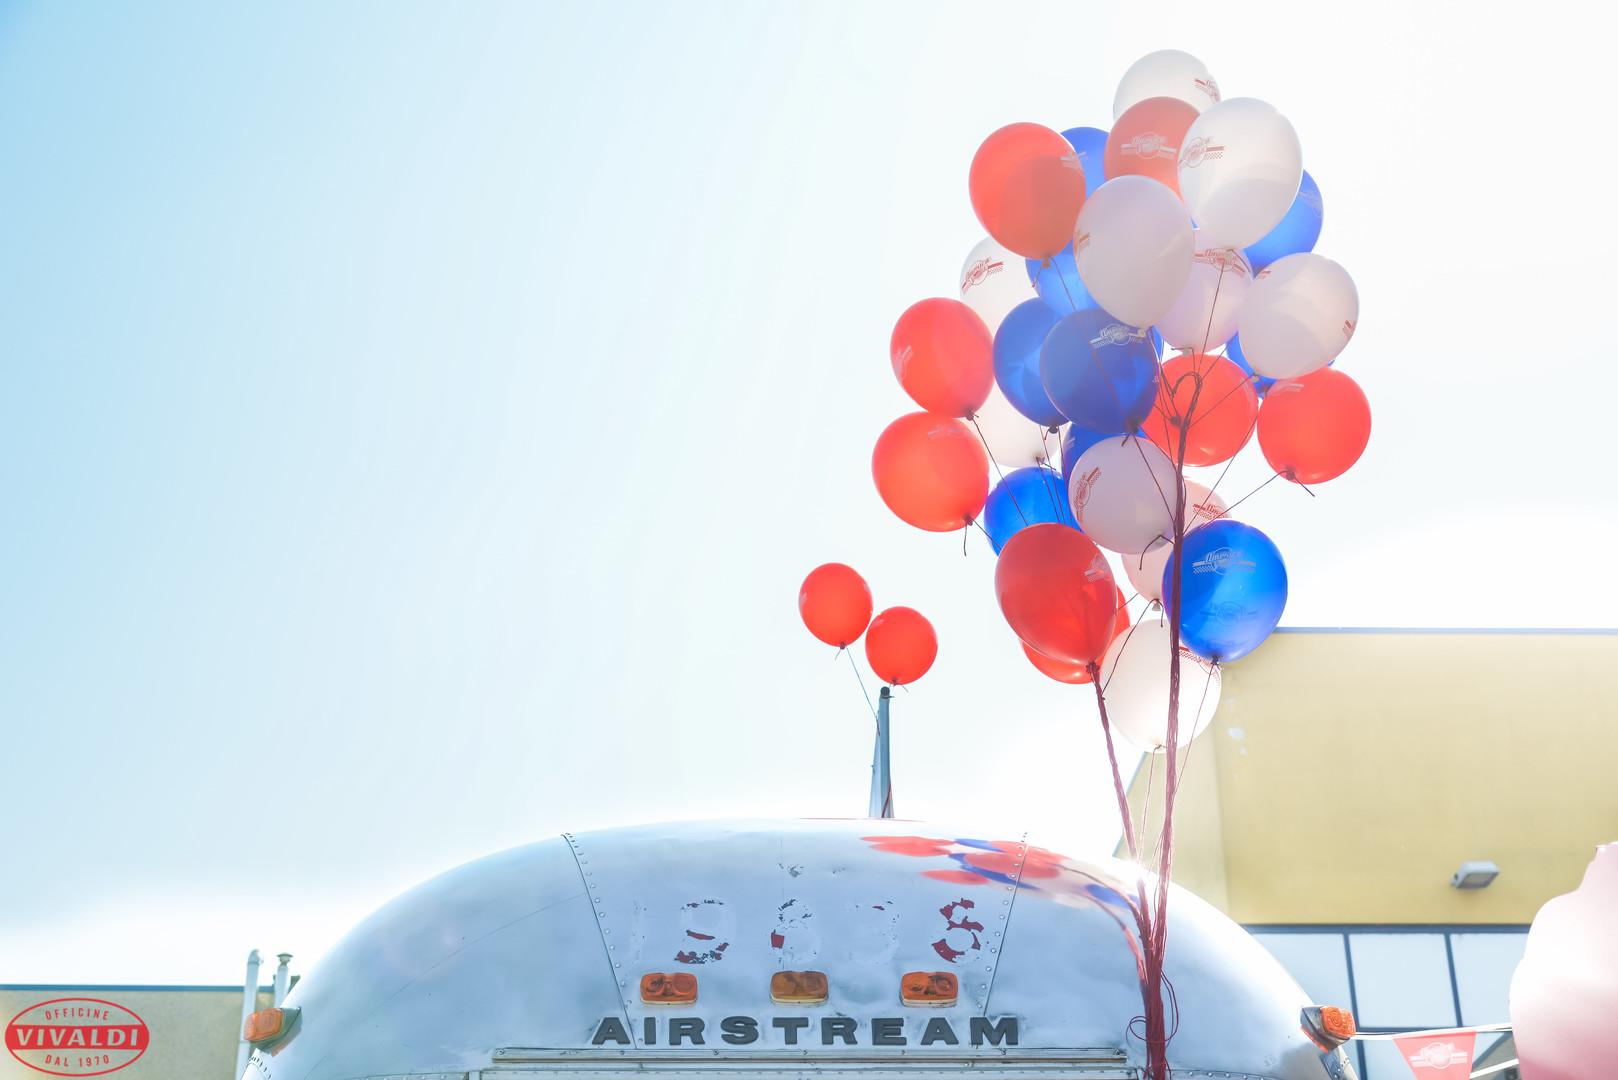 Airstream 29 feet noleggio by Officine V